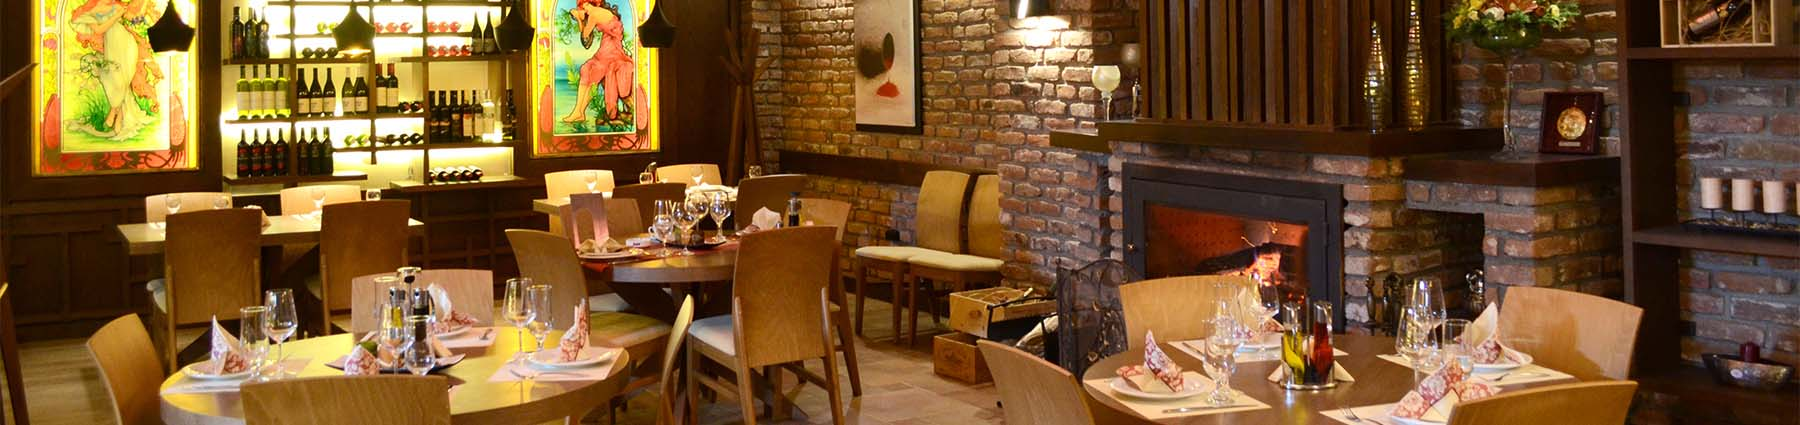 Ресторан Фиш